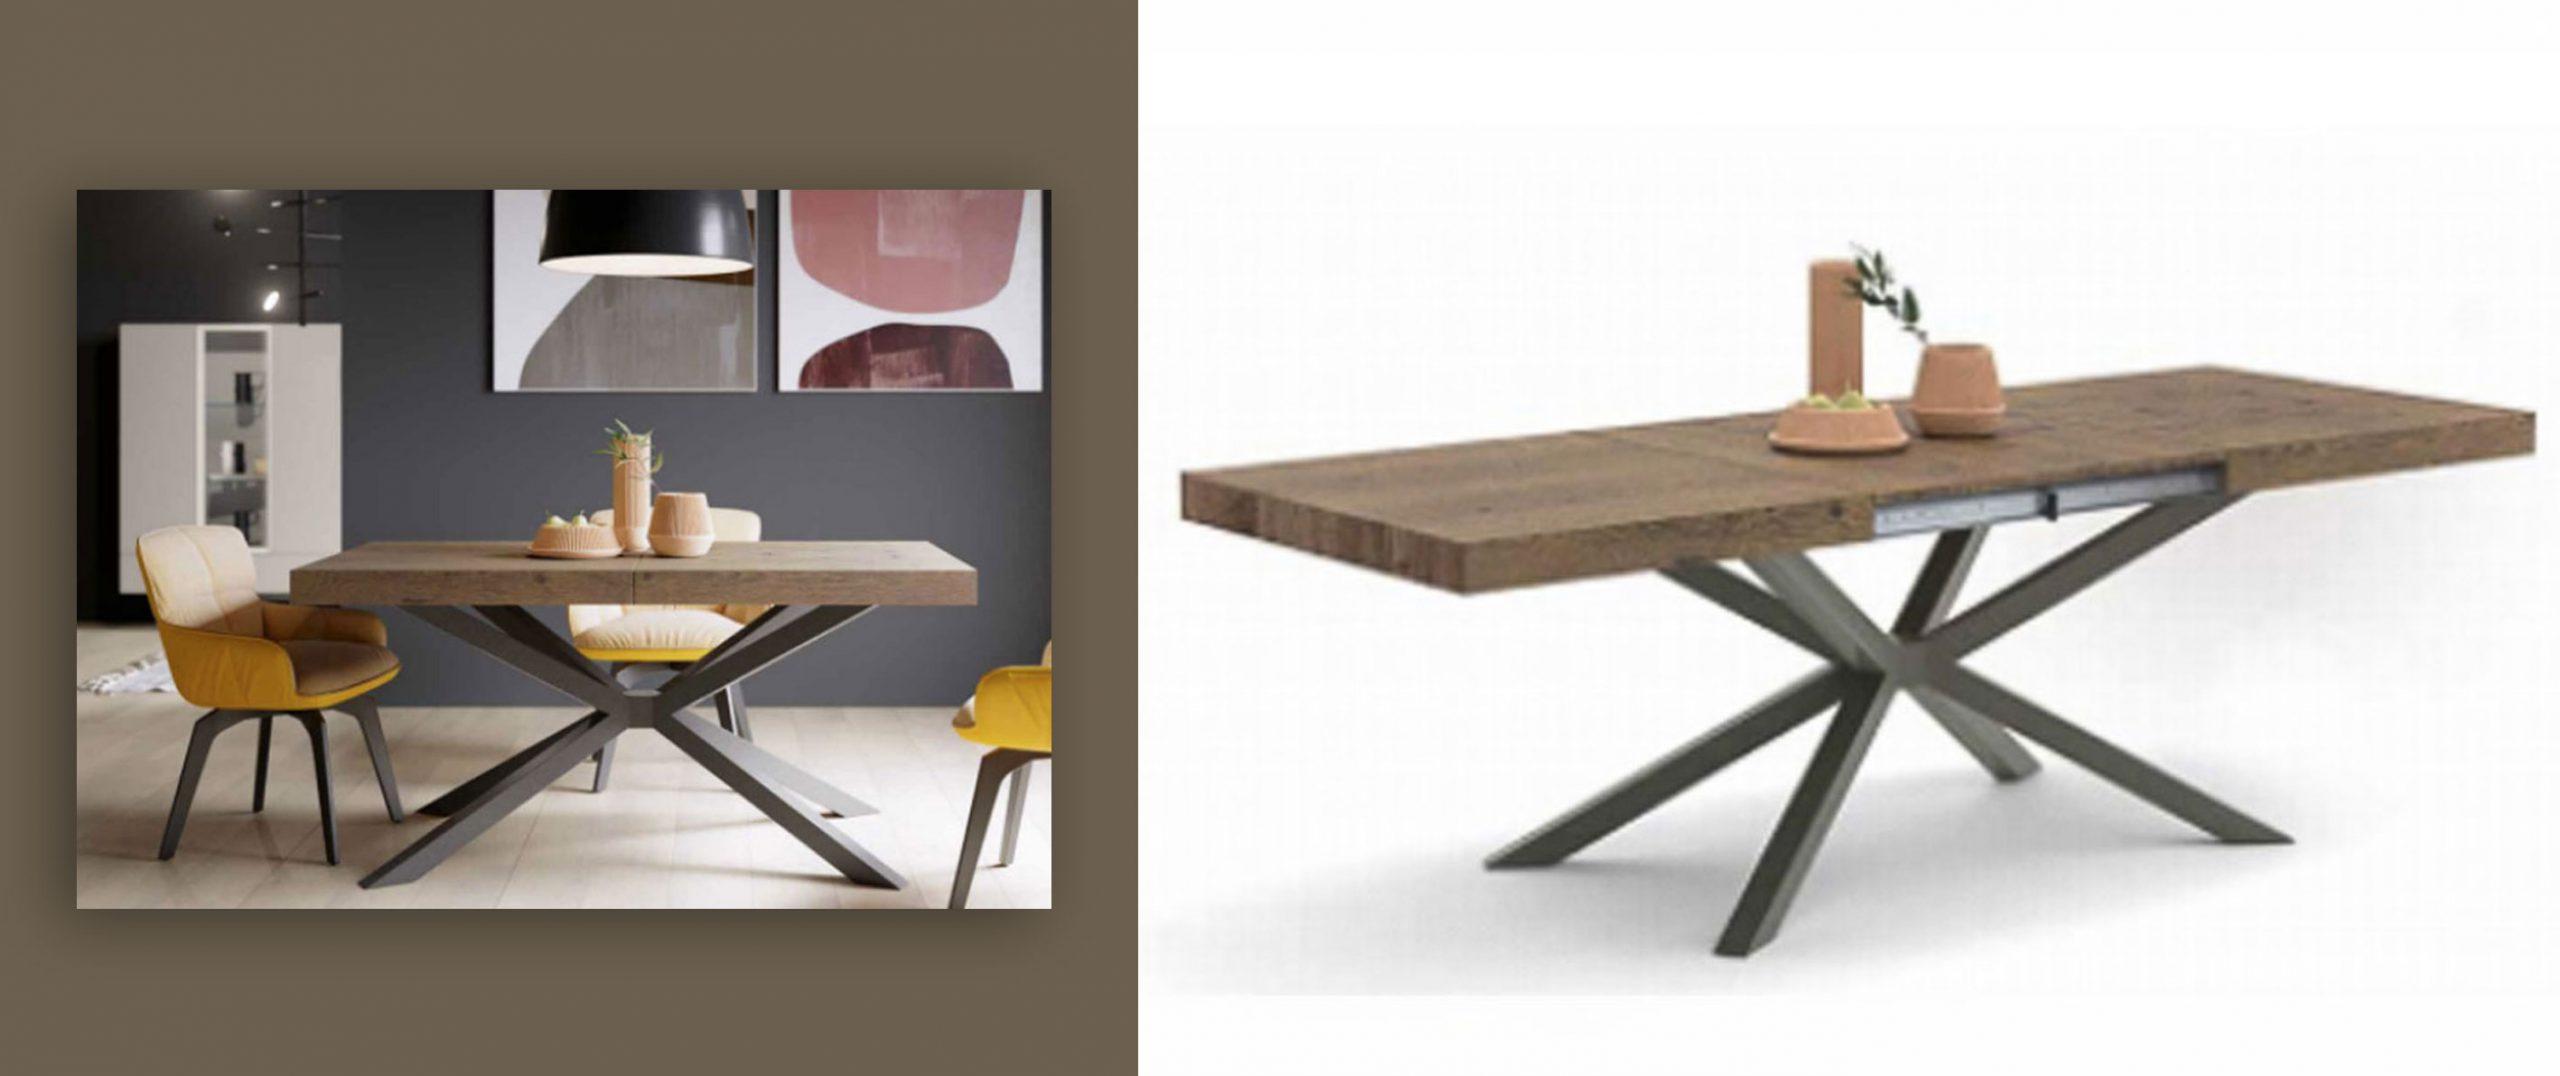 Mesa comedor Ckron extensible Muebles Toscana